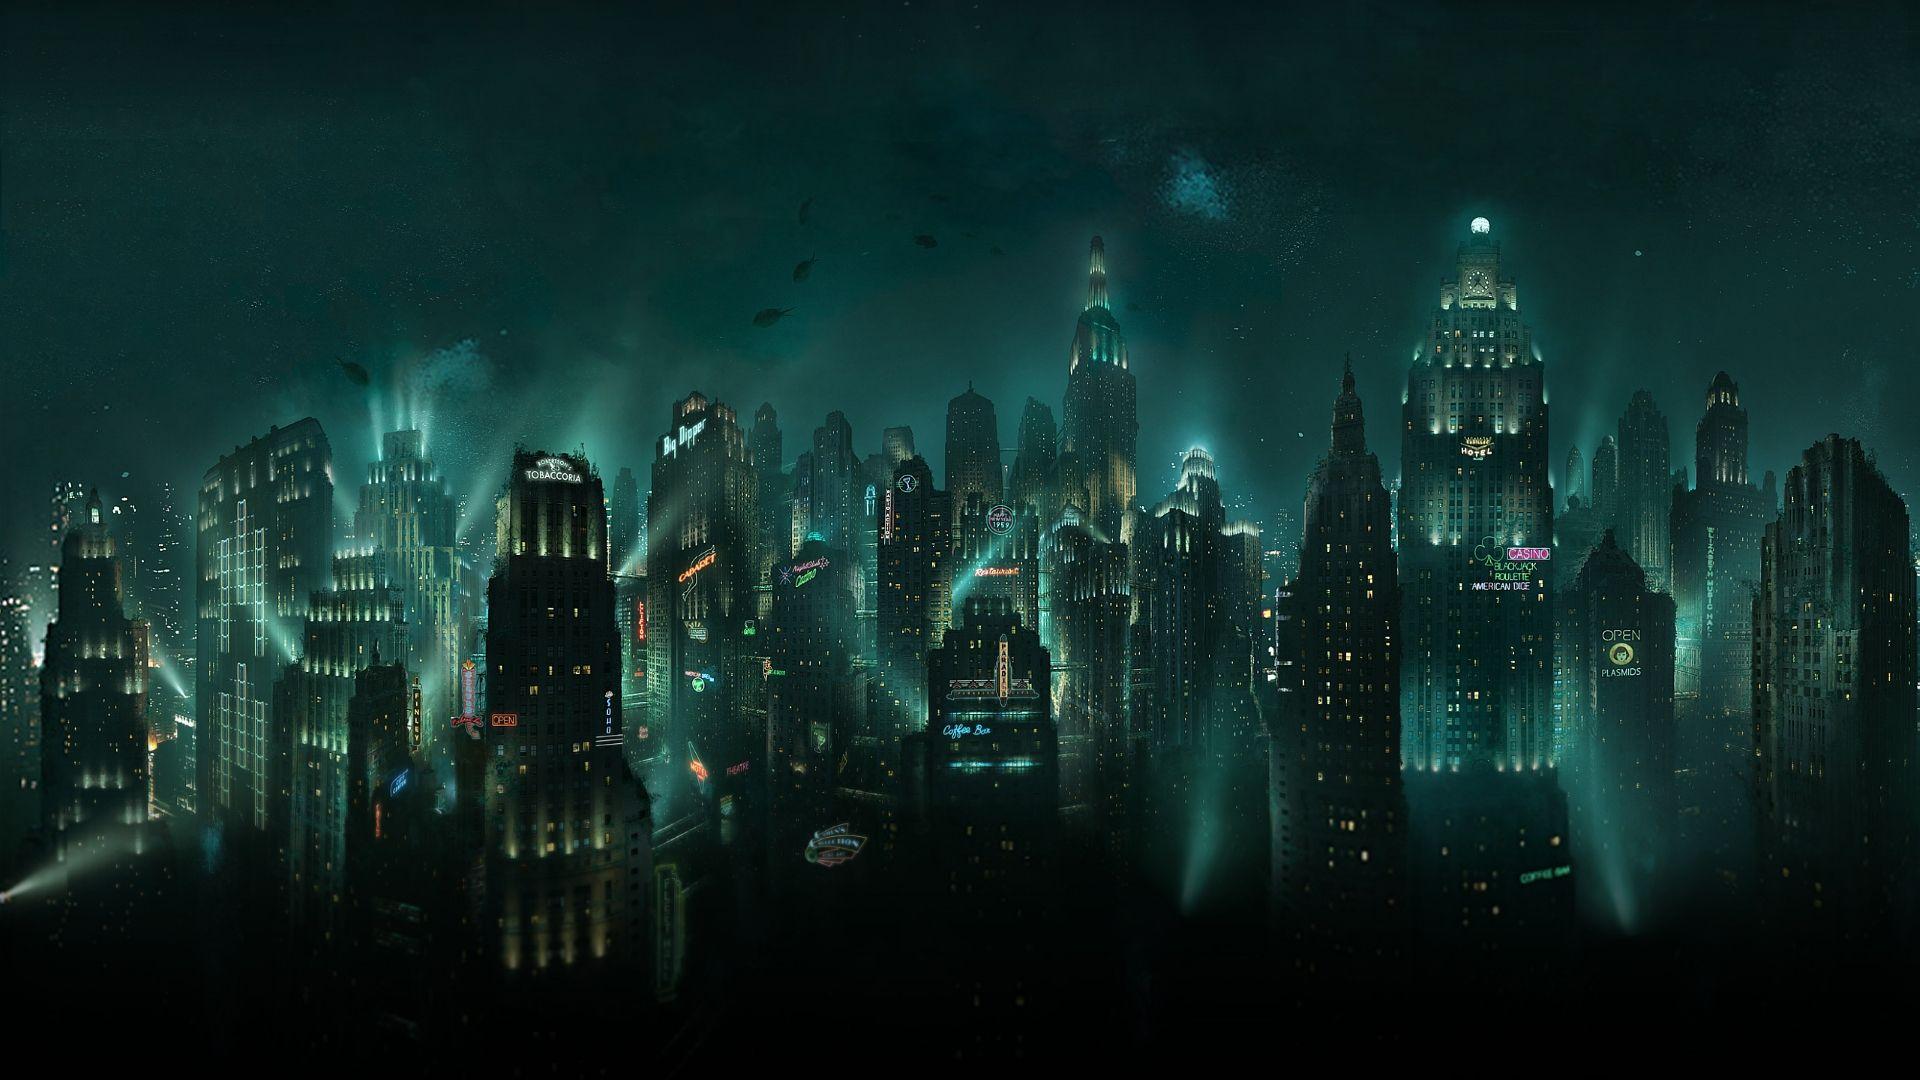 Top Collection Phone And Desktop Wallpaper Hd In 2020 Bioshock Bioshock Rapture Bioshock Art